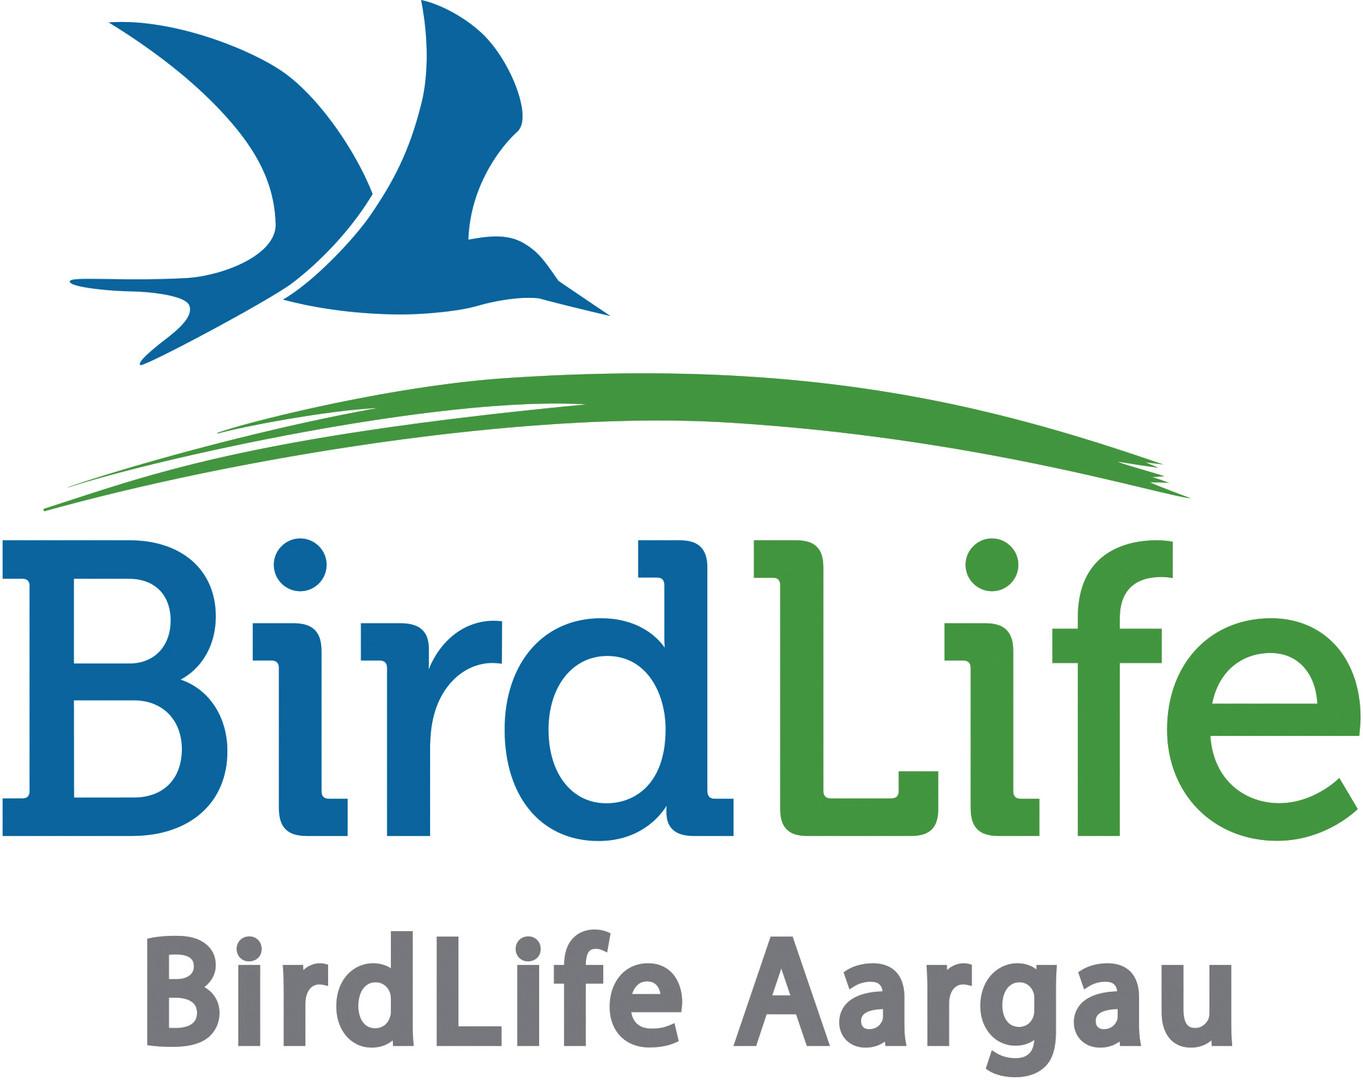 Birdlife Aargau